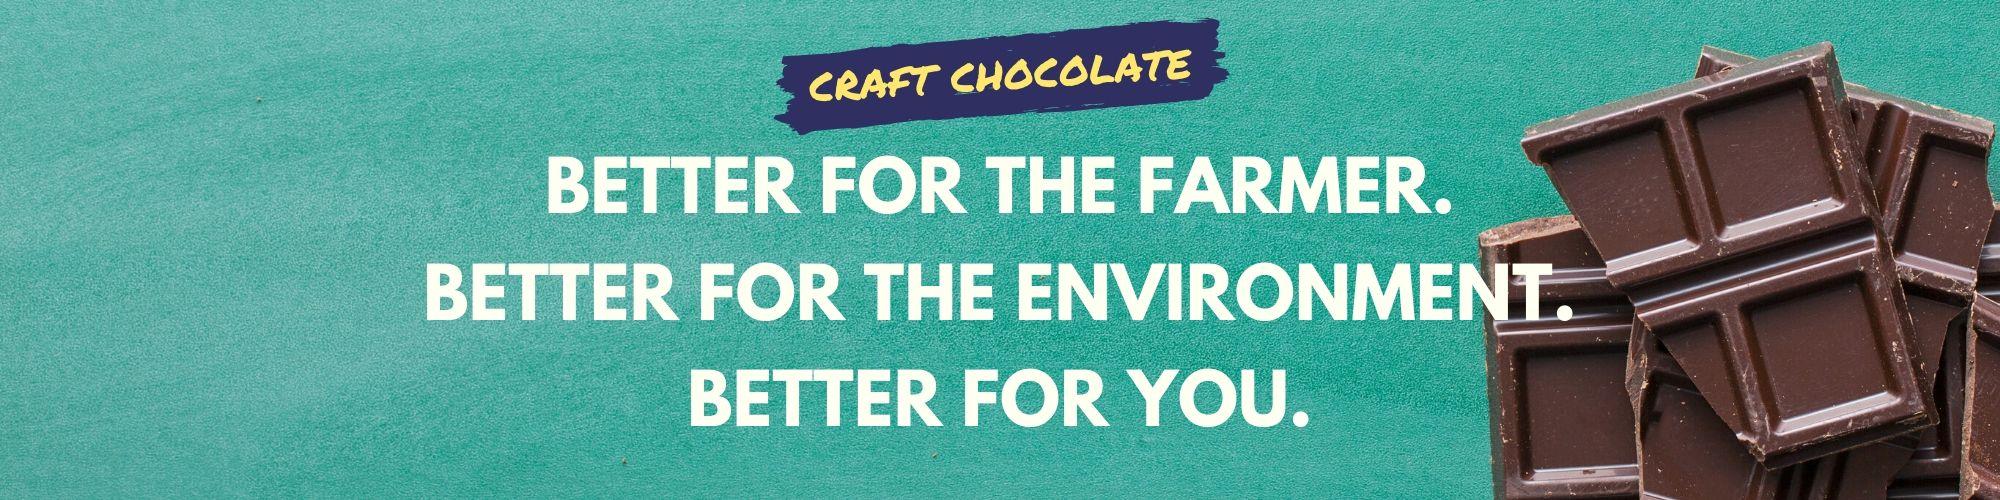 craft_chocolate_cacao_magazine